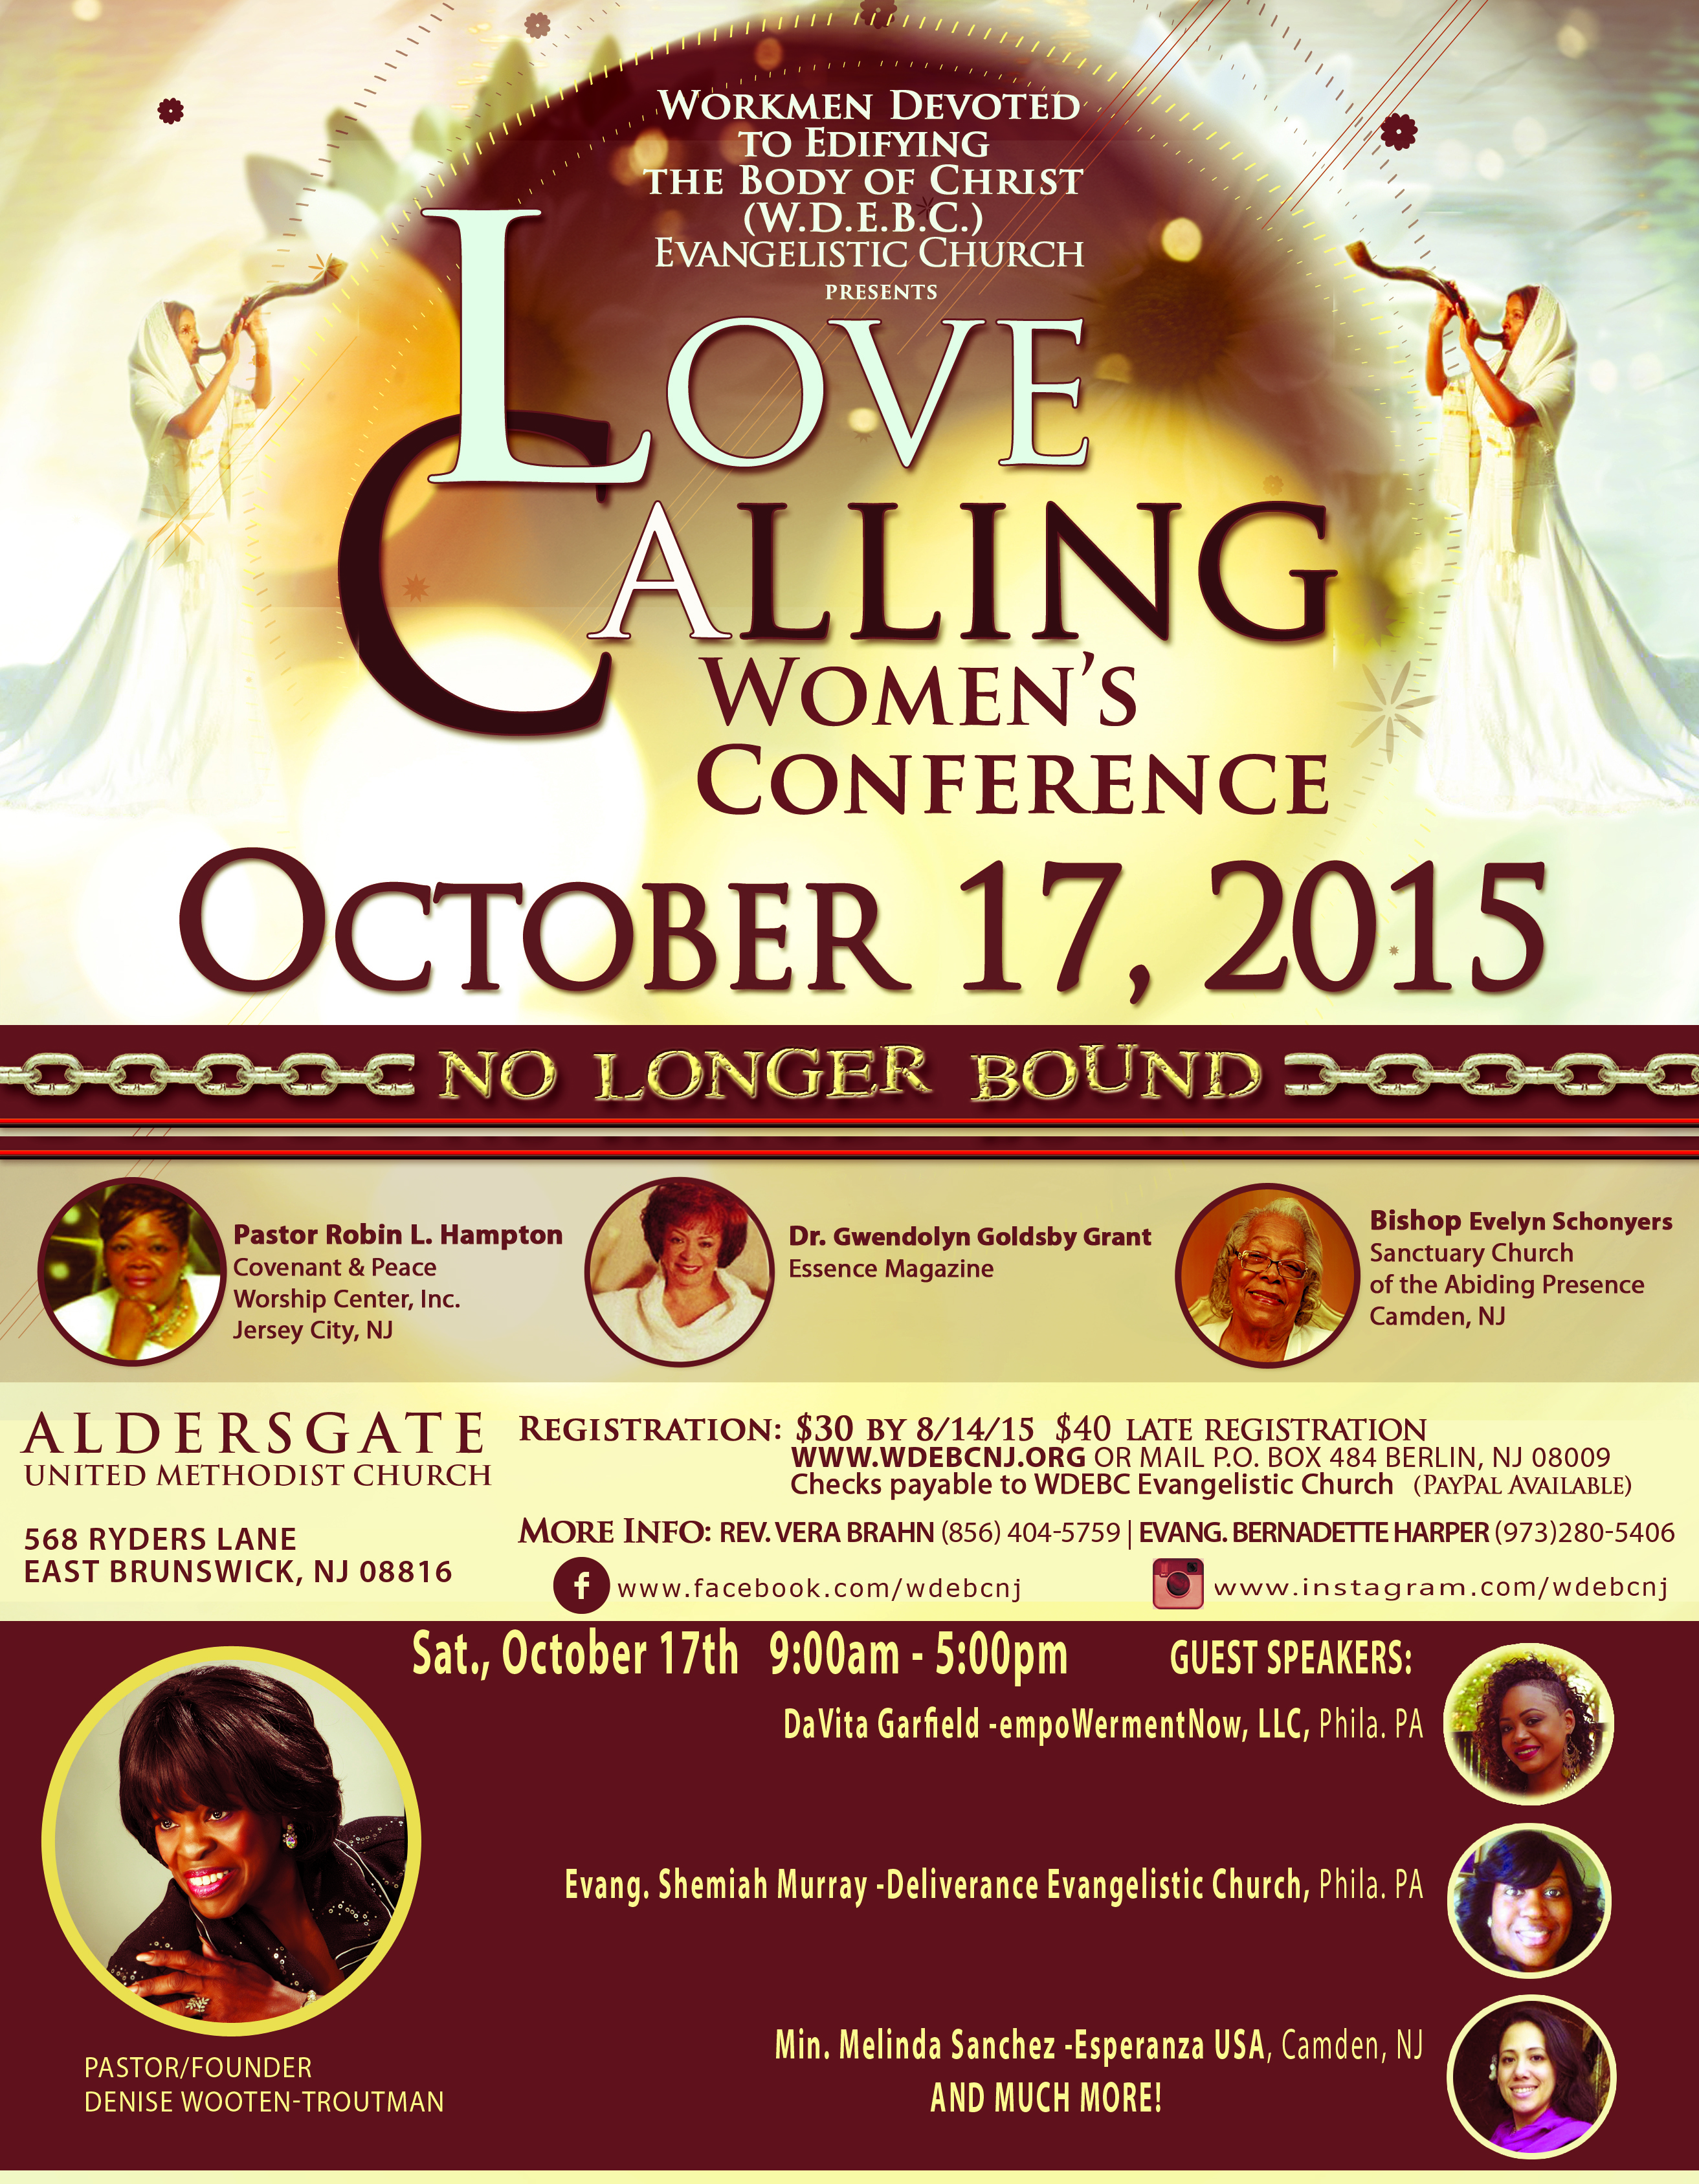 9a4e292d08a146ca1e1e_Women_Conference-WDEBC_Re5.jpg